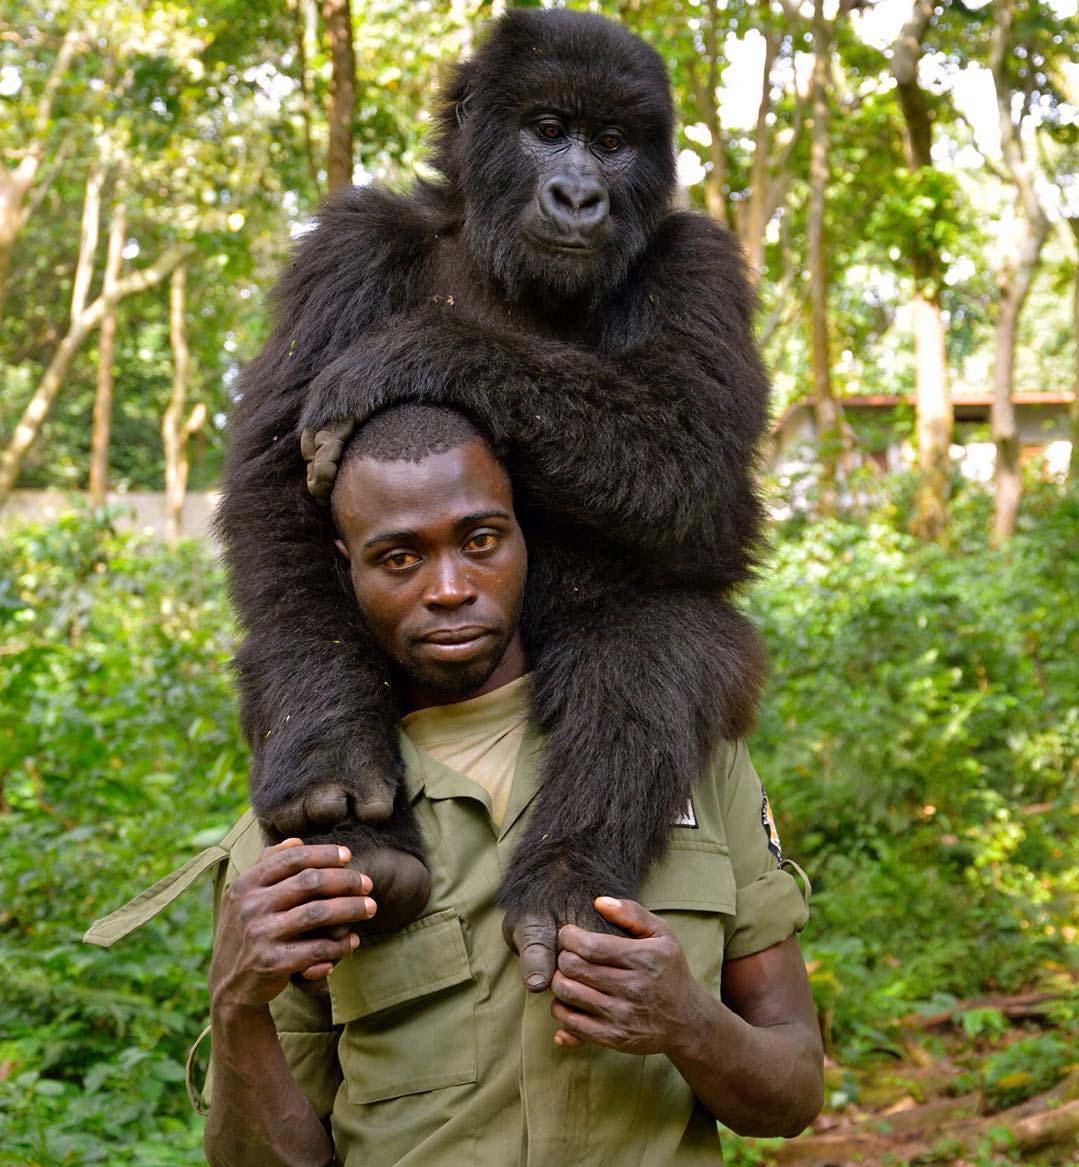 Guardaparques cuida de gorila